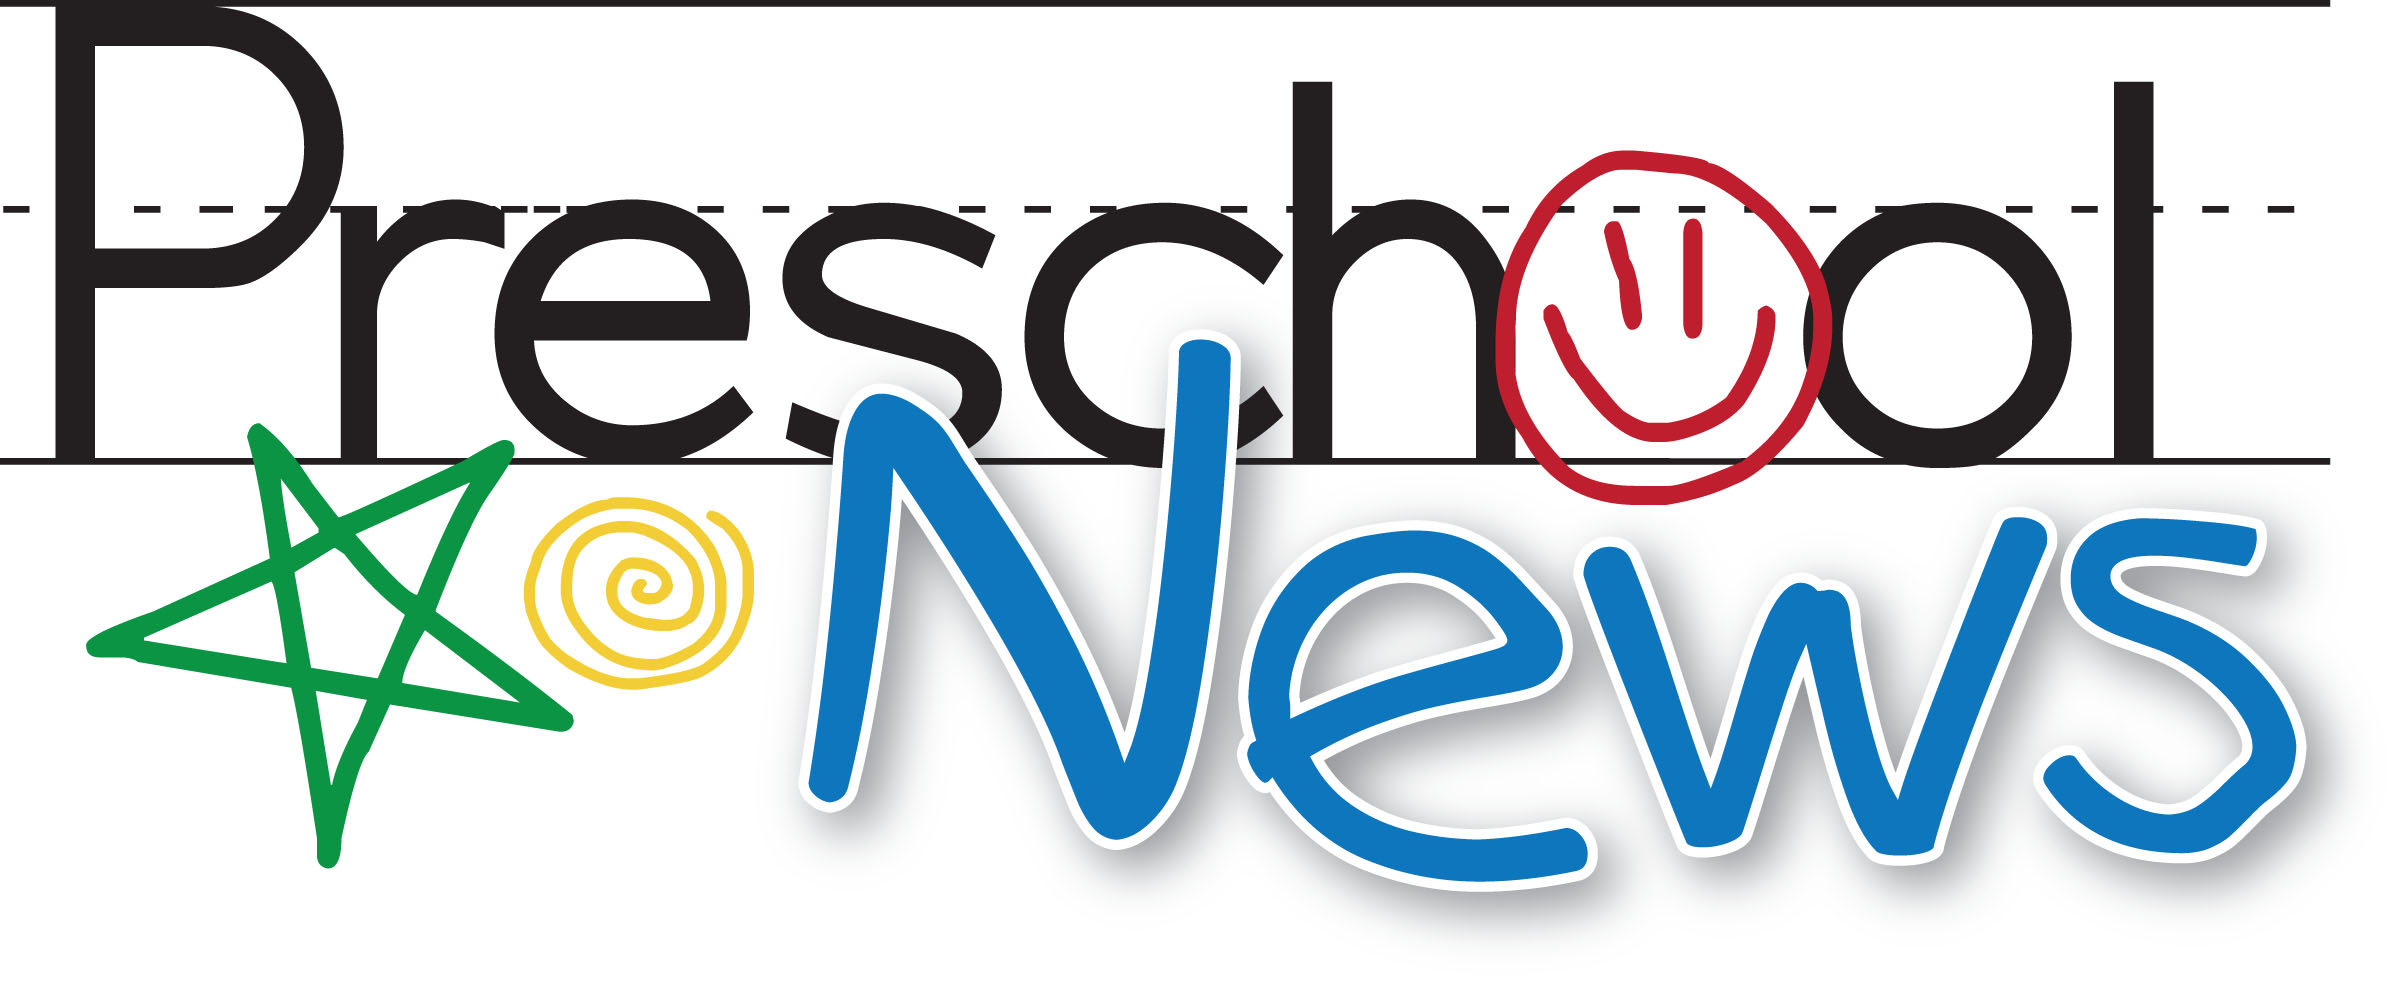 Newsletter deadline clipart clipart freeuse library Free Preschool Newsletter Cliparts, Download Free Clip Art ... clipart freeuse library